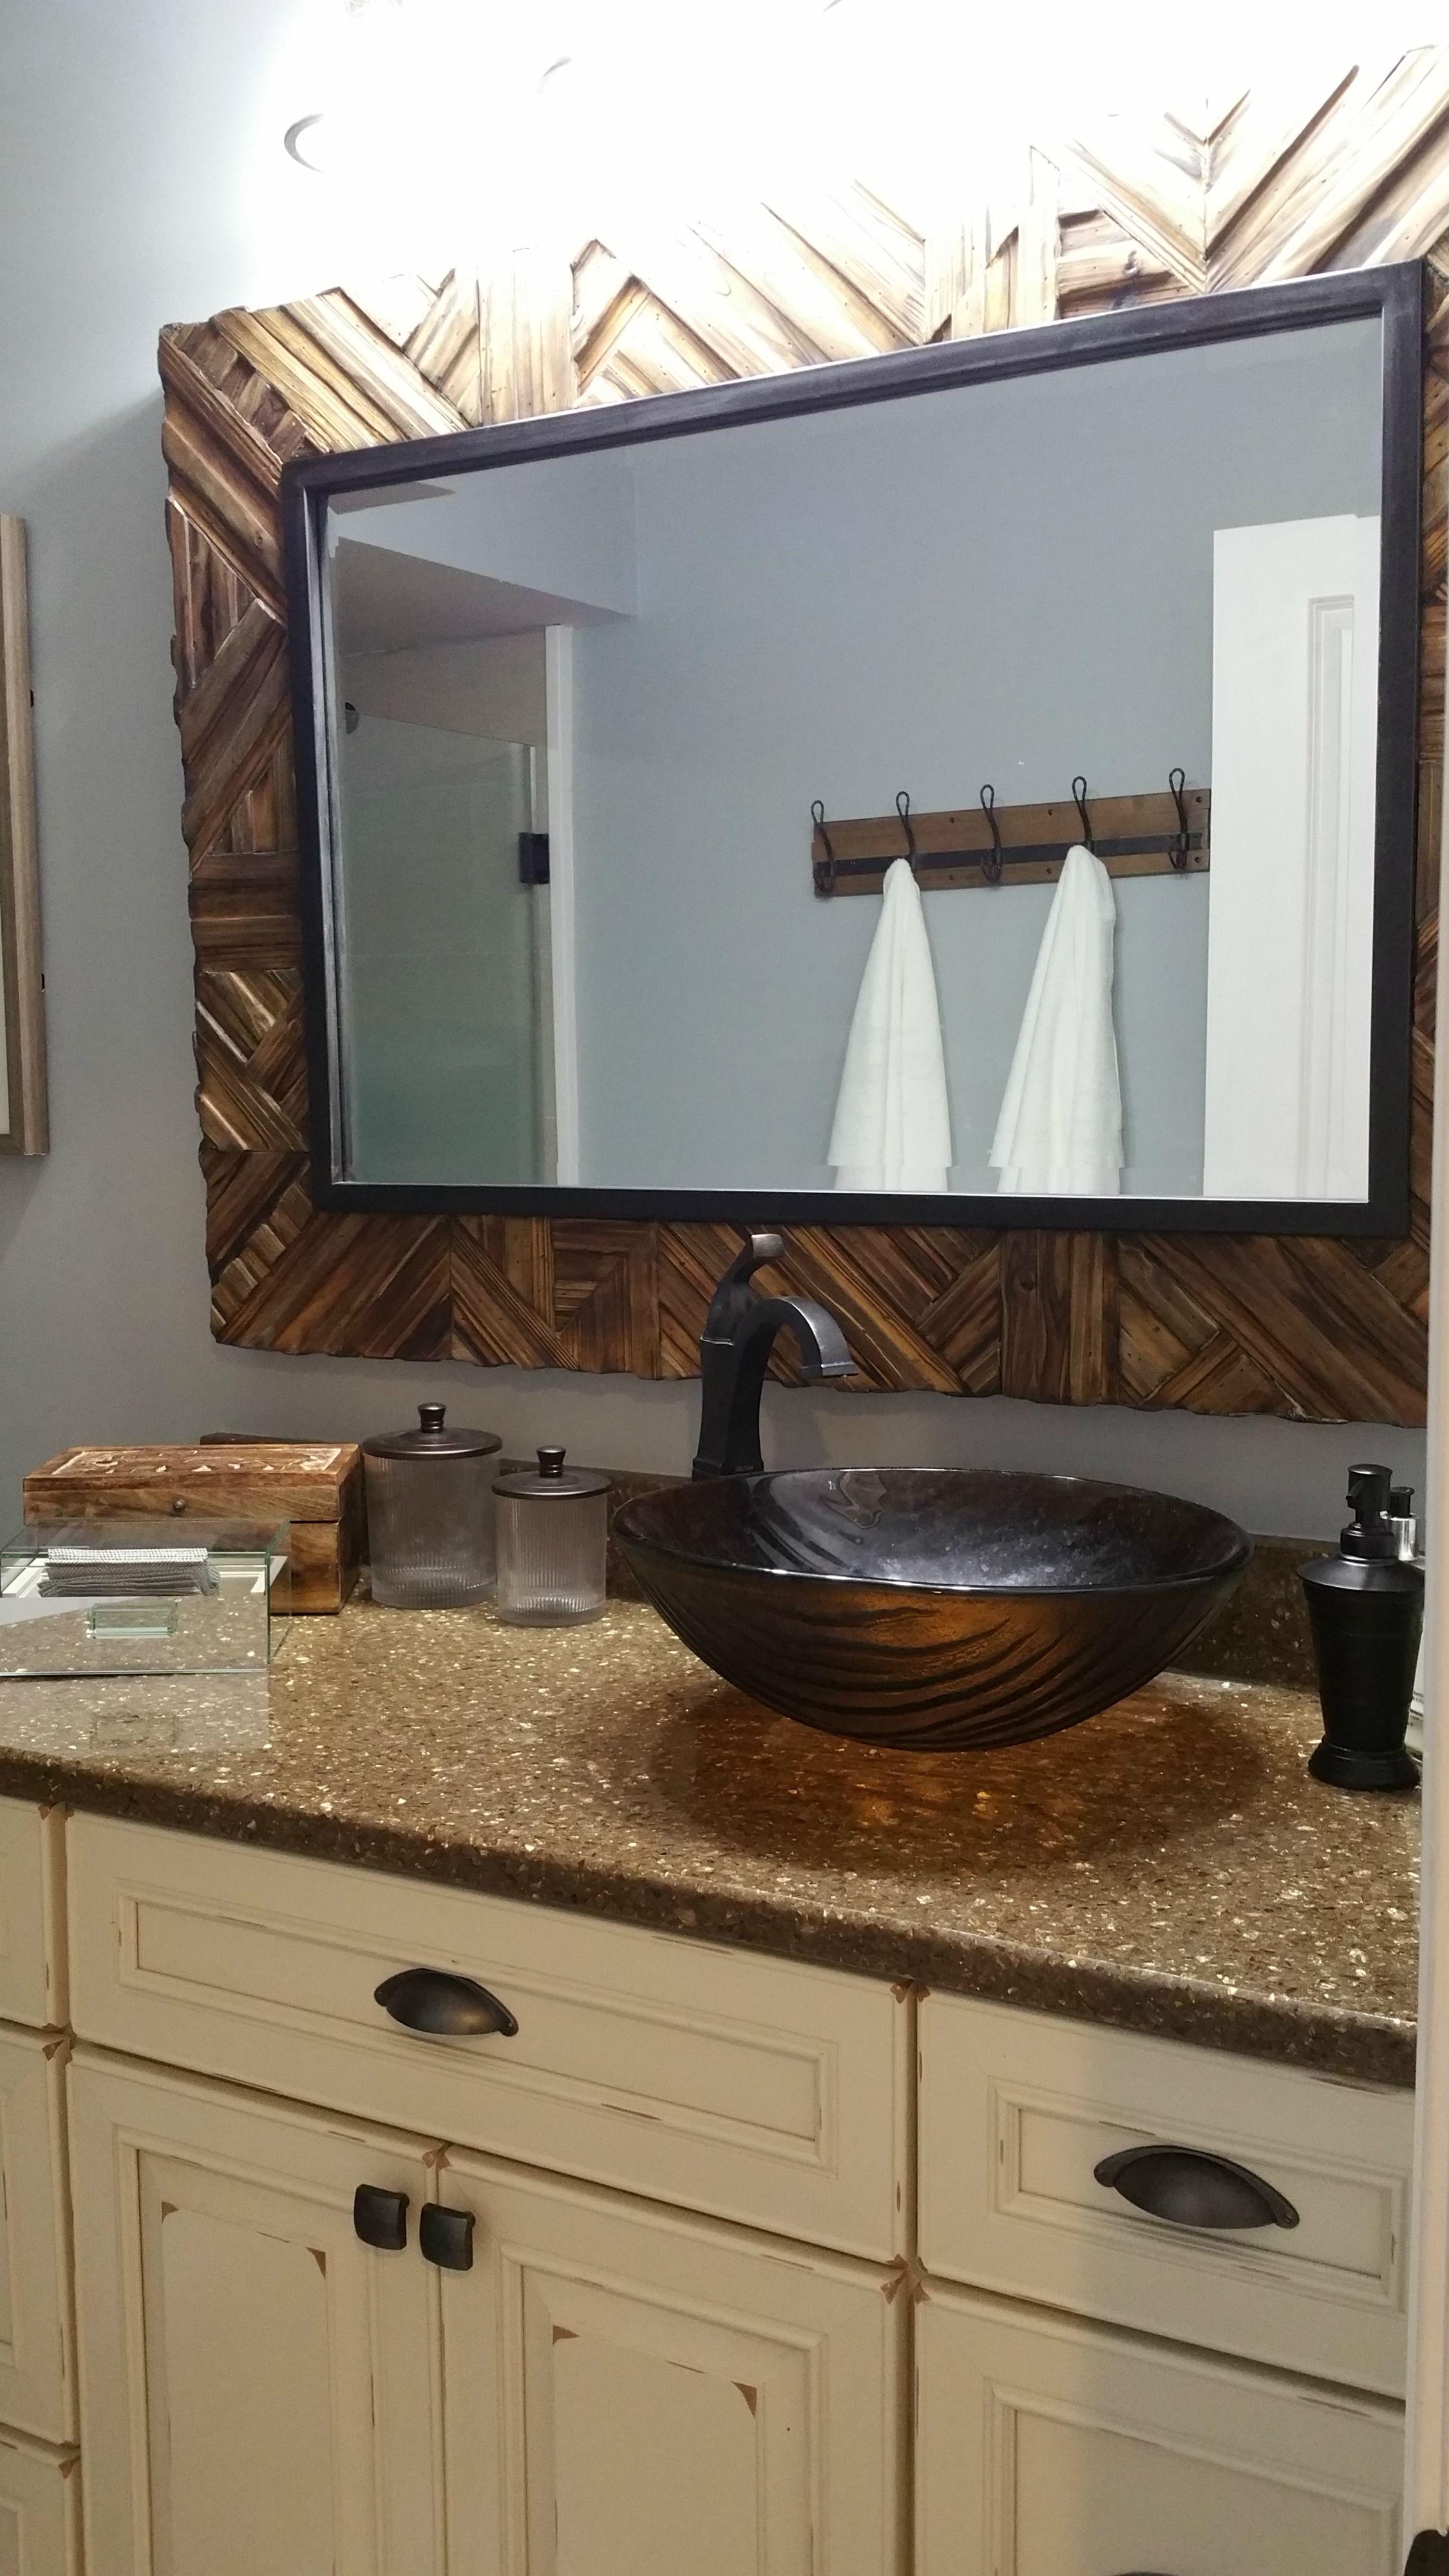 Nature Inspired Modern Bathroom A Deep Brown Vessel Sink Sits On Top Of A Granite Countertop With A Lighter W Modern Bathroom Vessel Sink Bathroom Wood Vanity Sink that sits on top of counter